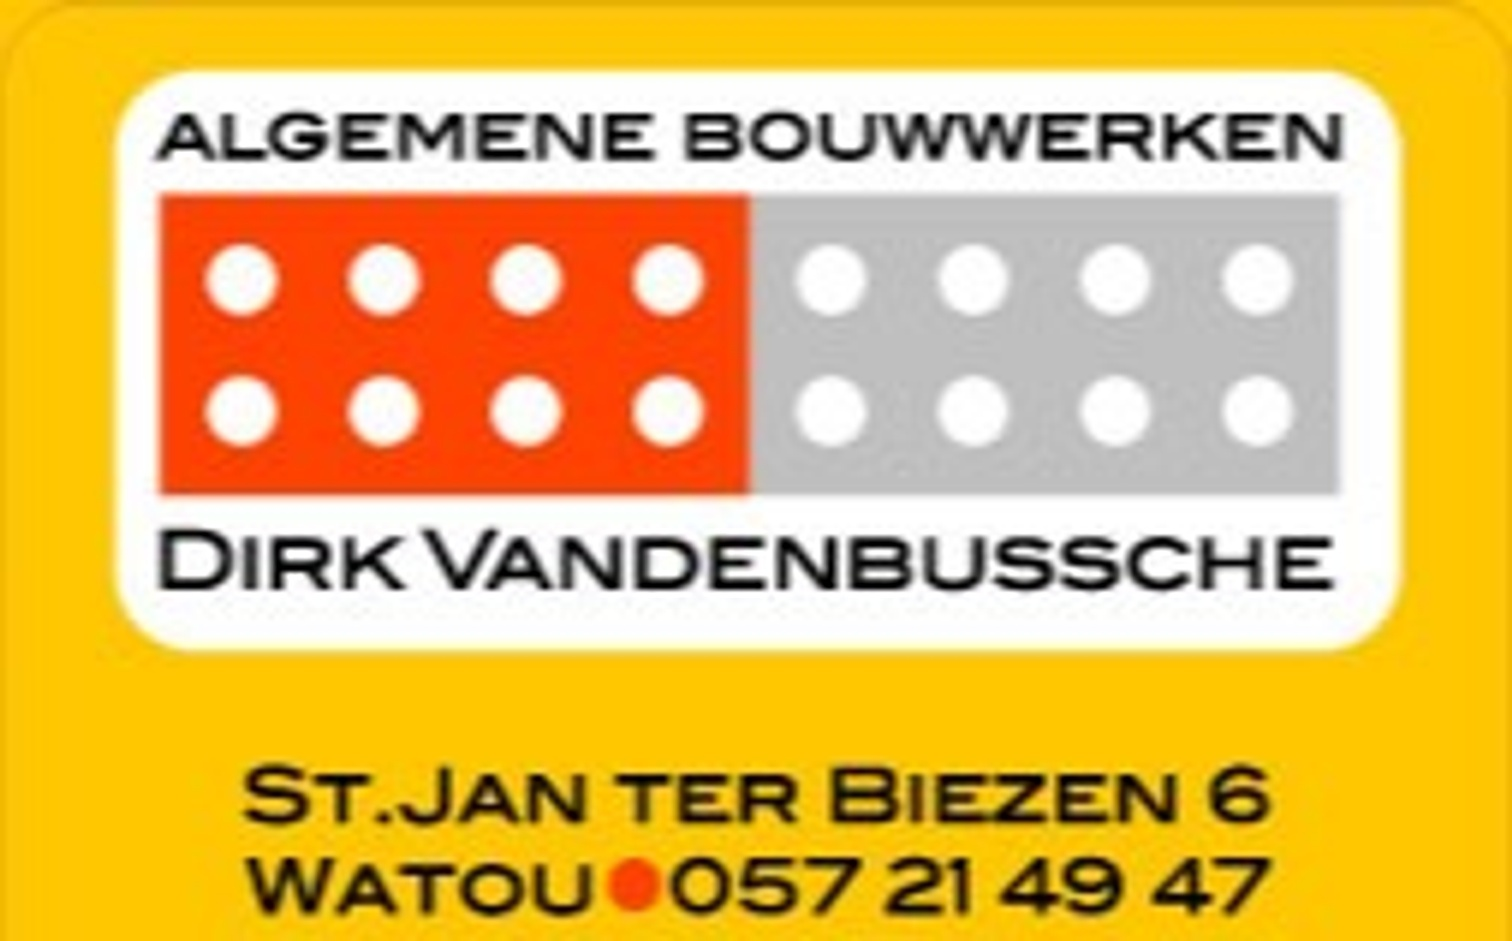 logo Algemene Bouwwerken Dirk Vandenbussche